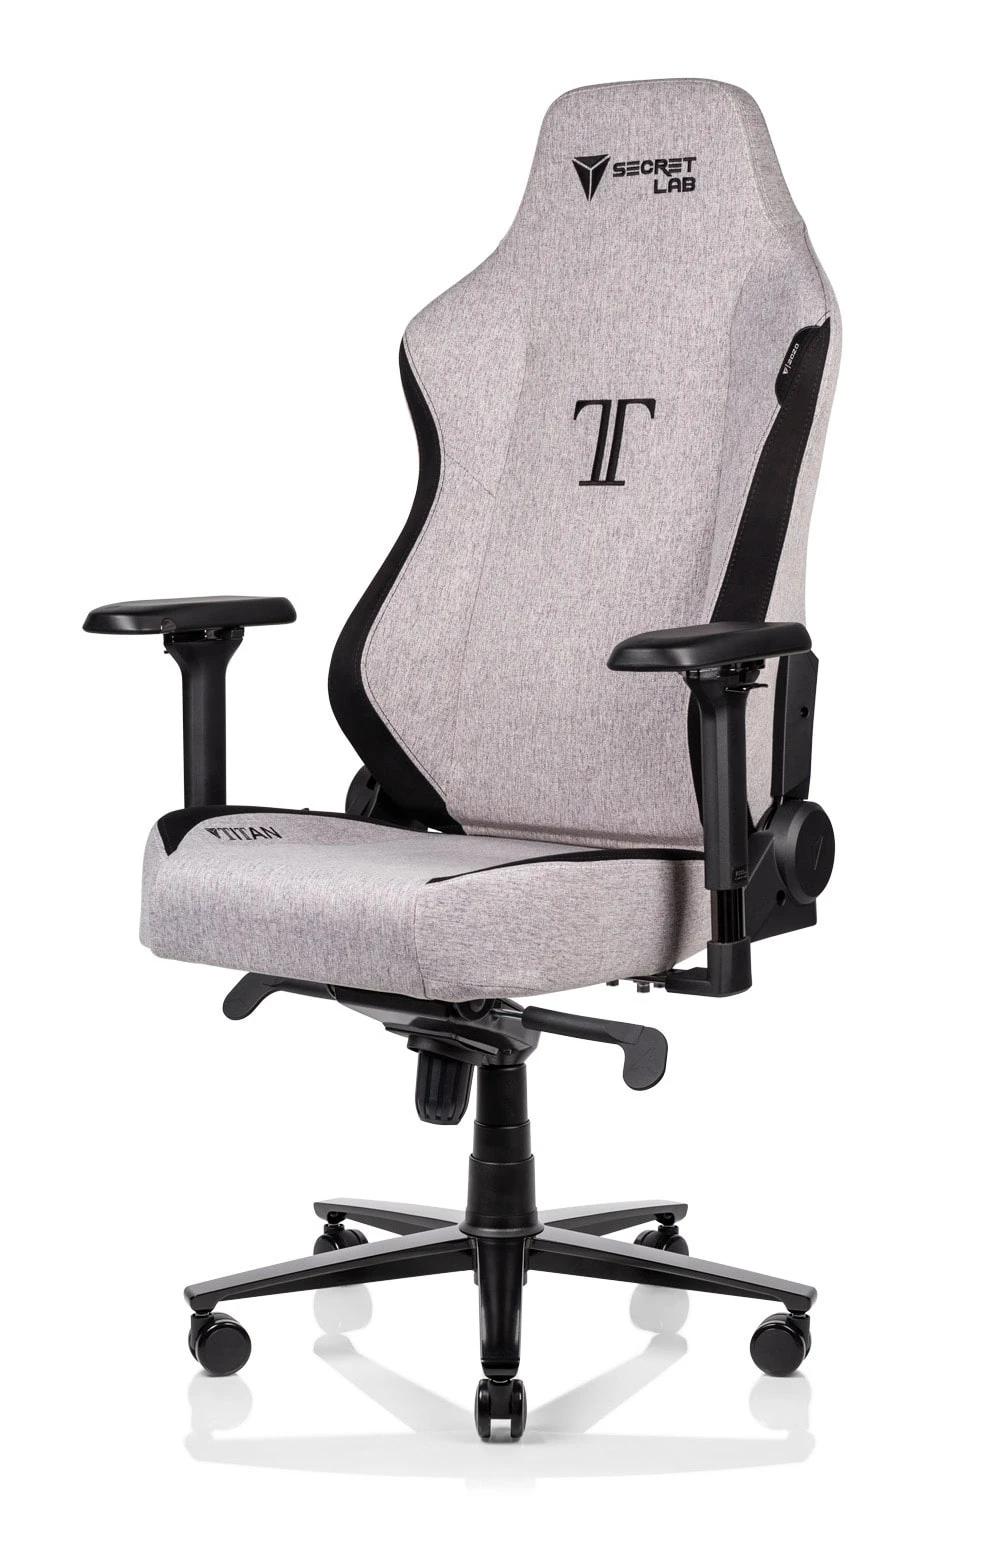 Titan Series Gaming Chairs Secretlab Us Gaming Chair Chair Large Chair